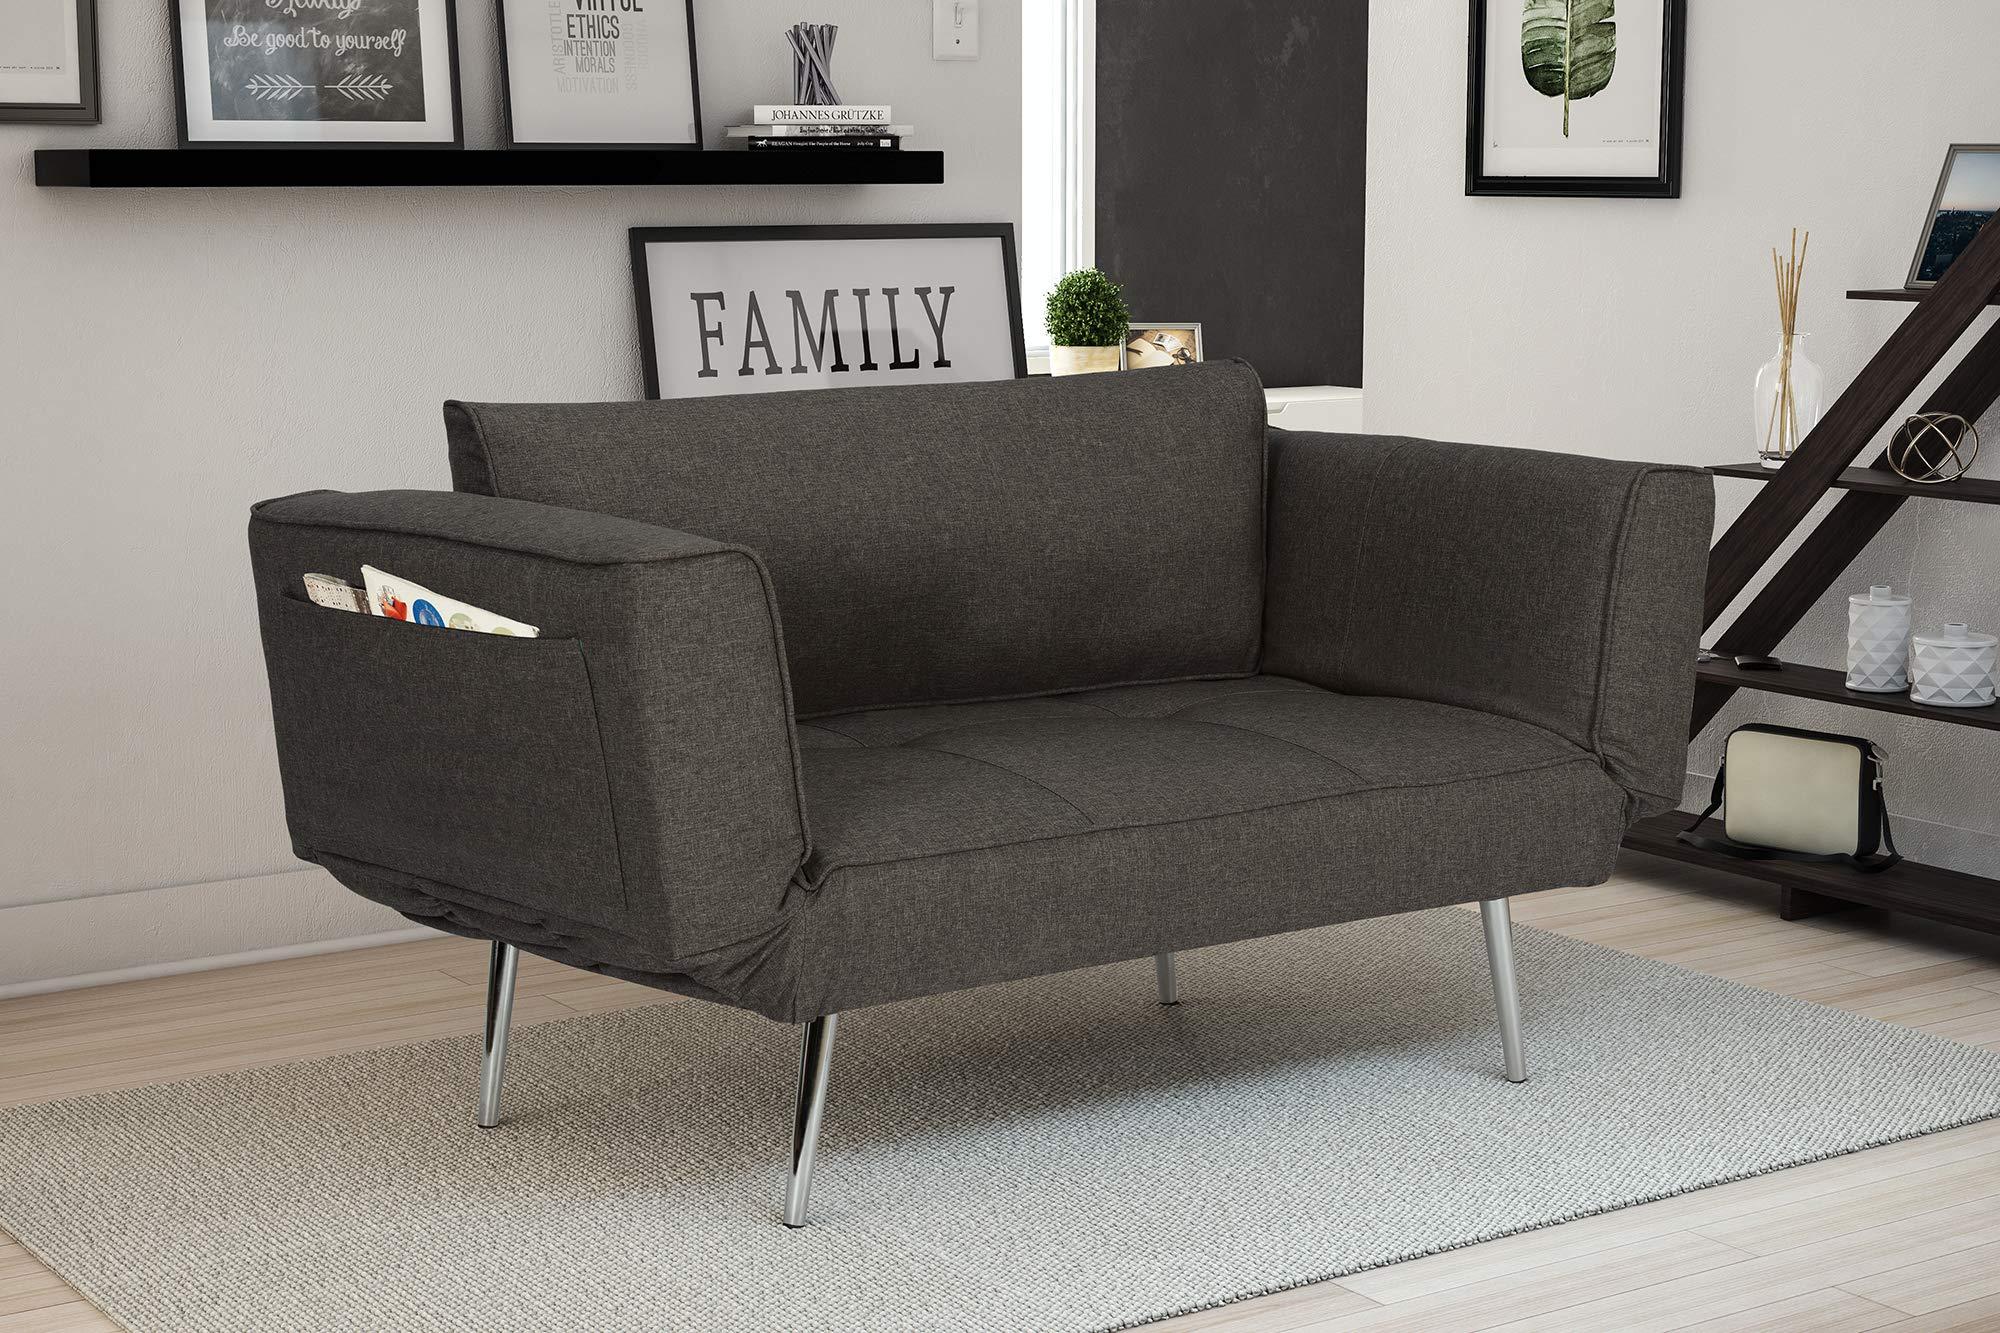 Novogratz Leyla Loveseat, Multifunctional and Modern Design, Adjustable Armrests to Create a Couch Sleeper -Grey by Novogratz